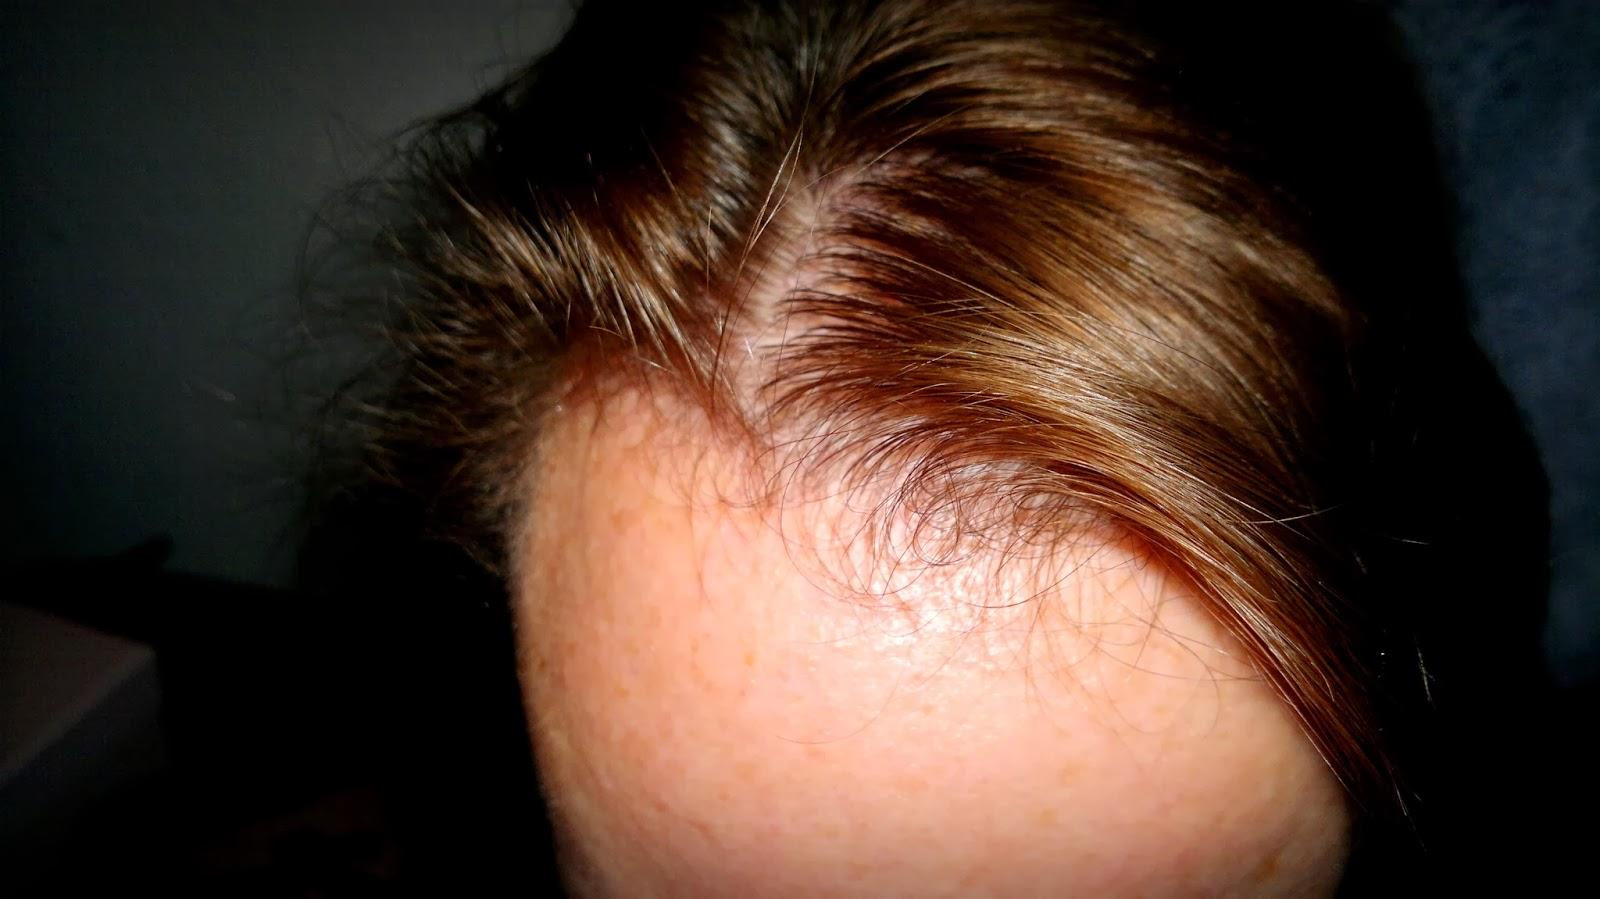 Dass das Haar zu träumen prolabieren